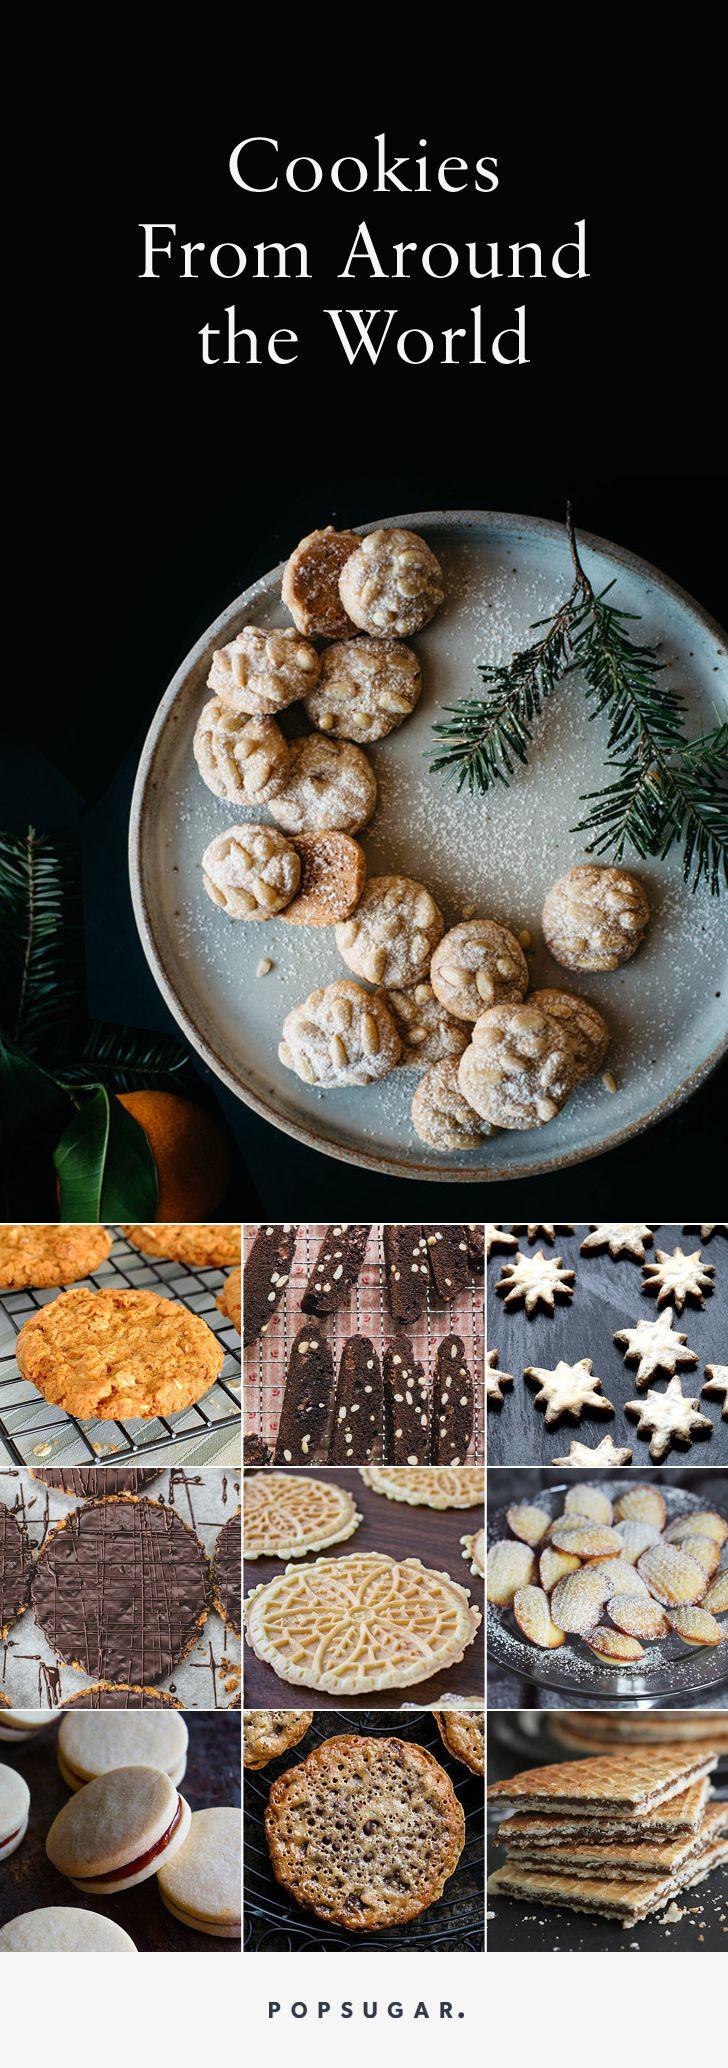 25 Cookies From Around the World Desserts around the